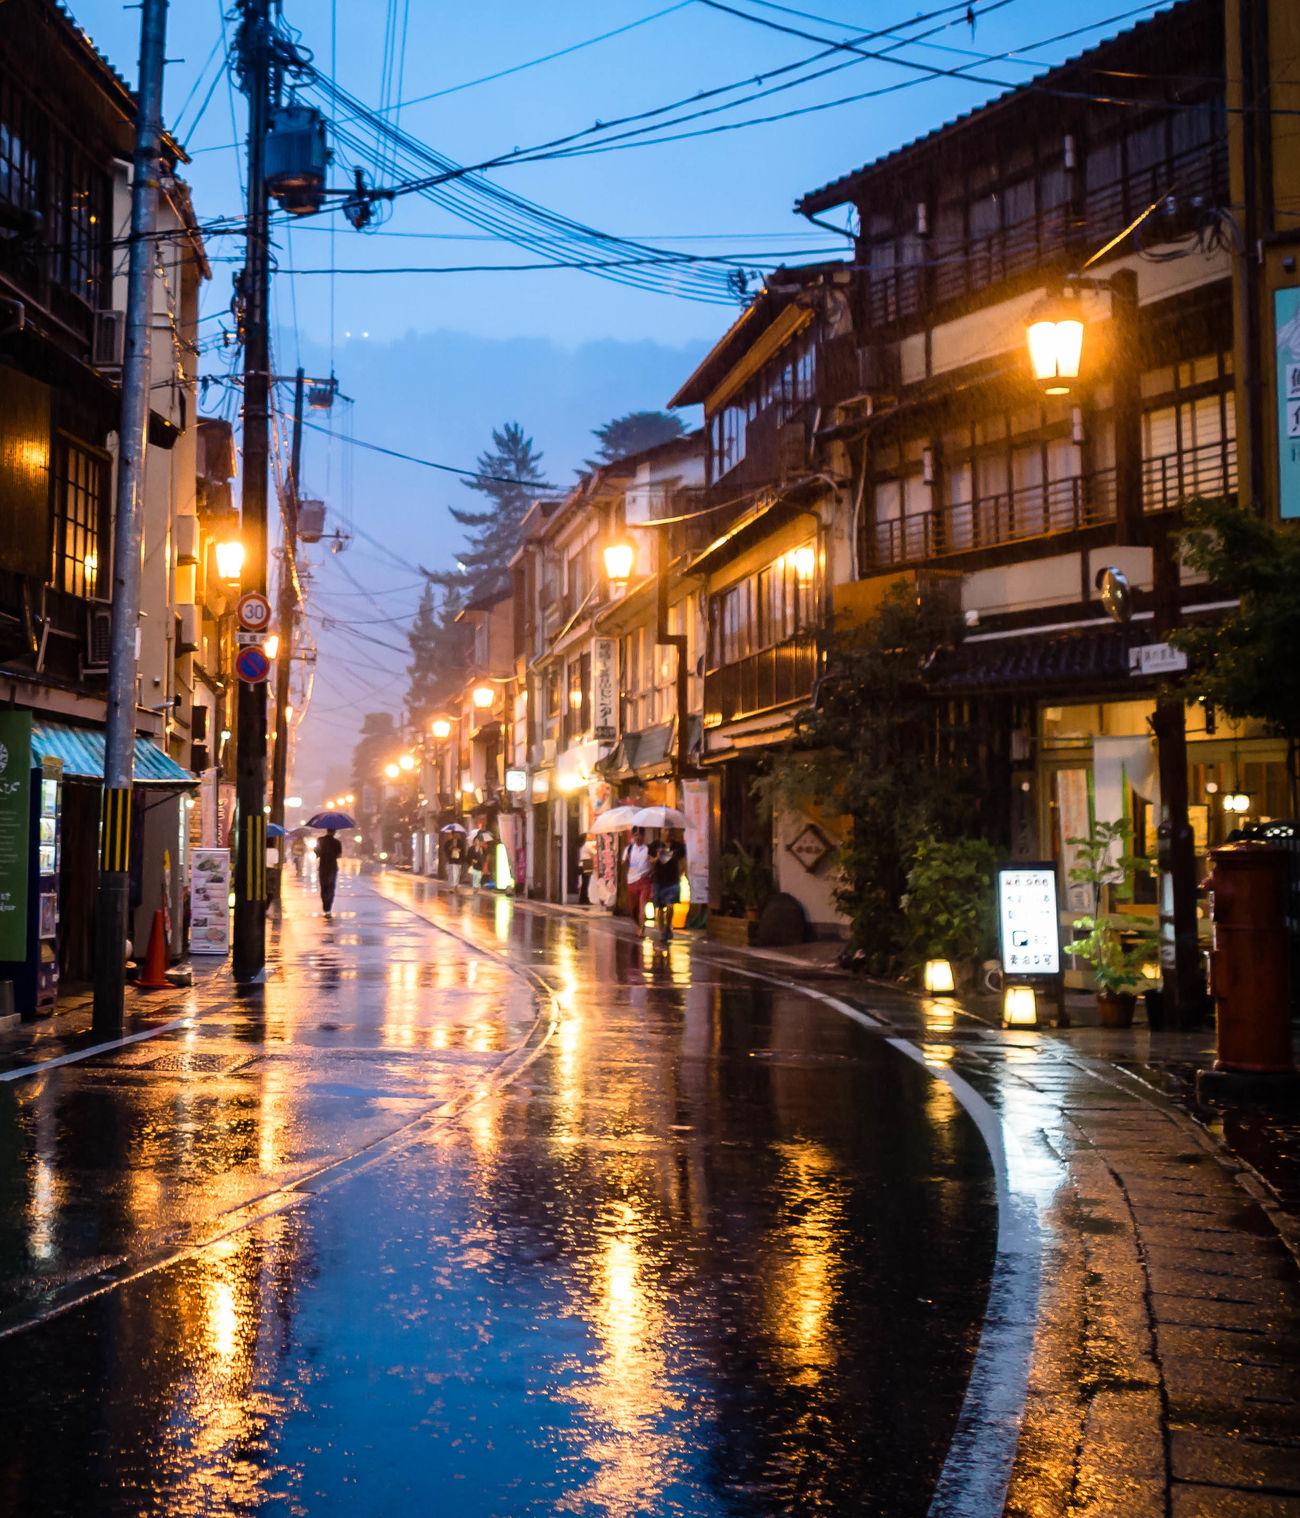 Kinosaki, a hot spring town north of Kobe, as the typhoon approached. Japan Onsen Kinosaki Night Hot Springs Typhoon 城崎温泉 温泉 Streetphotography